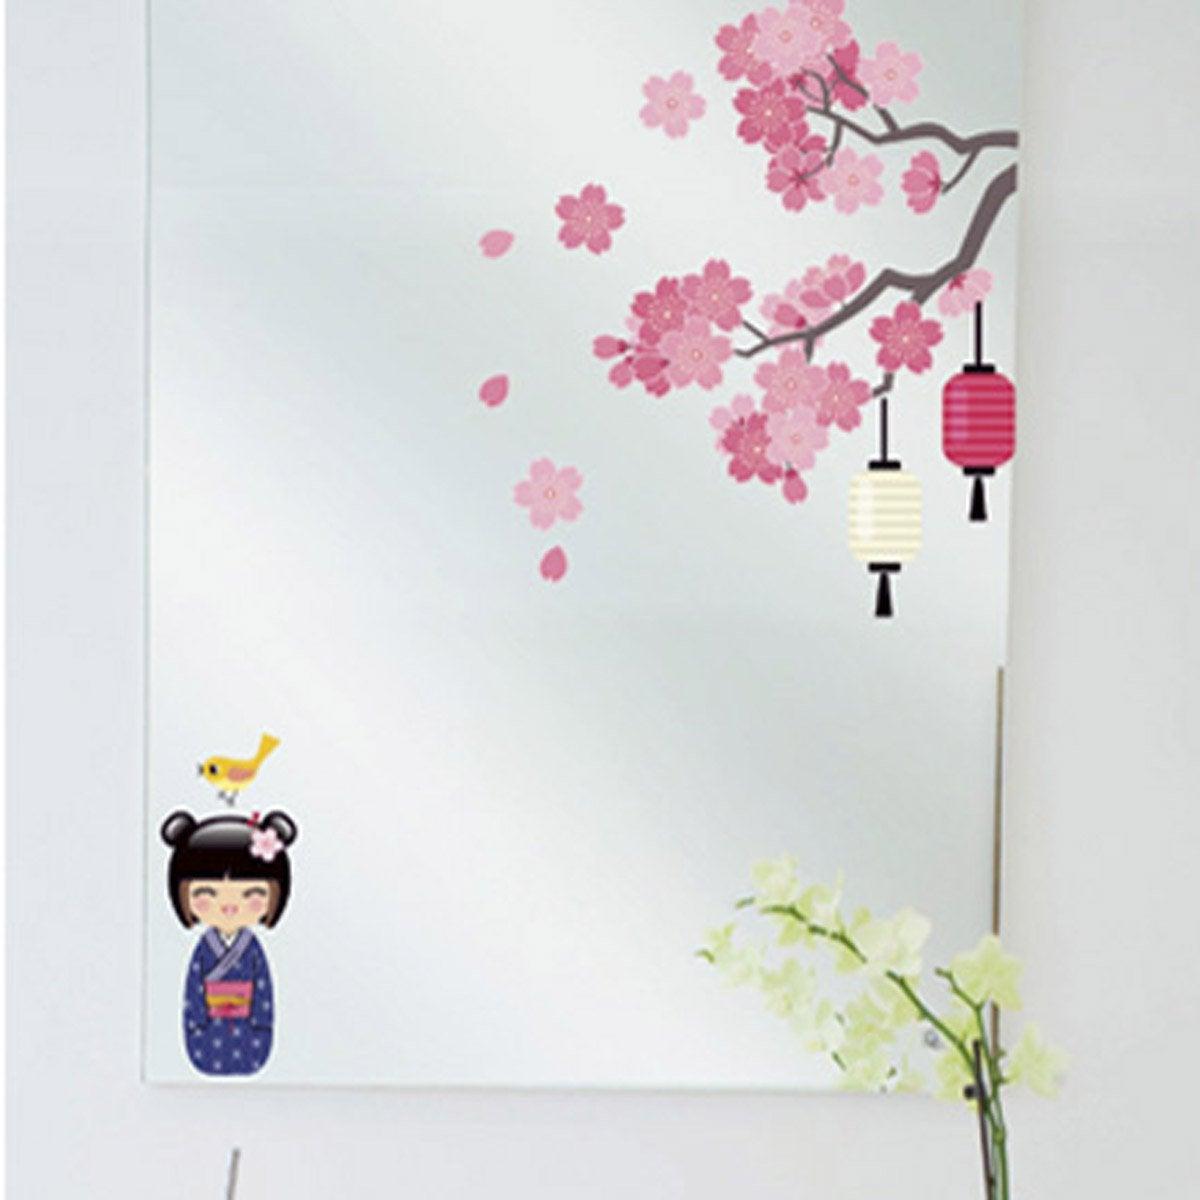 Sticker printemps de la kokeshi 24 cm x 69 cm leroy merlin for Stickers pour fenetre leroy merlin